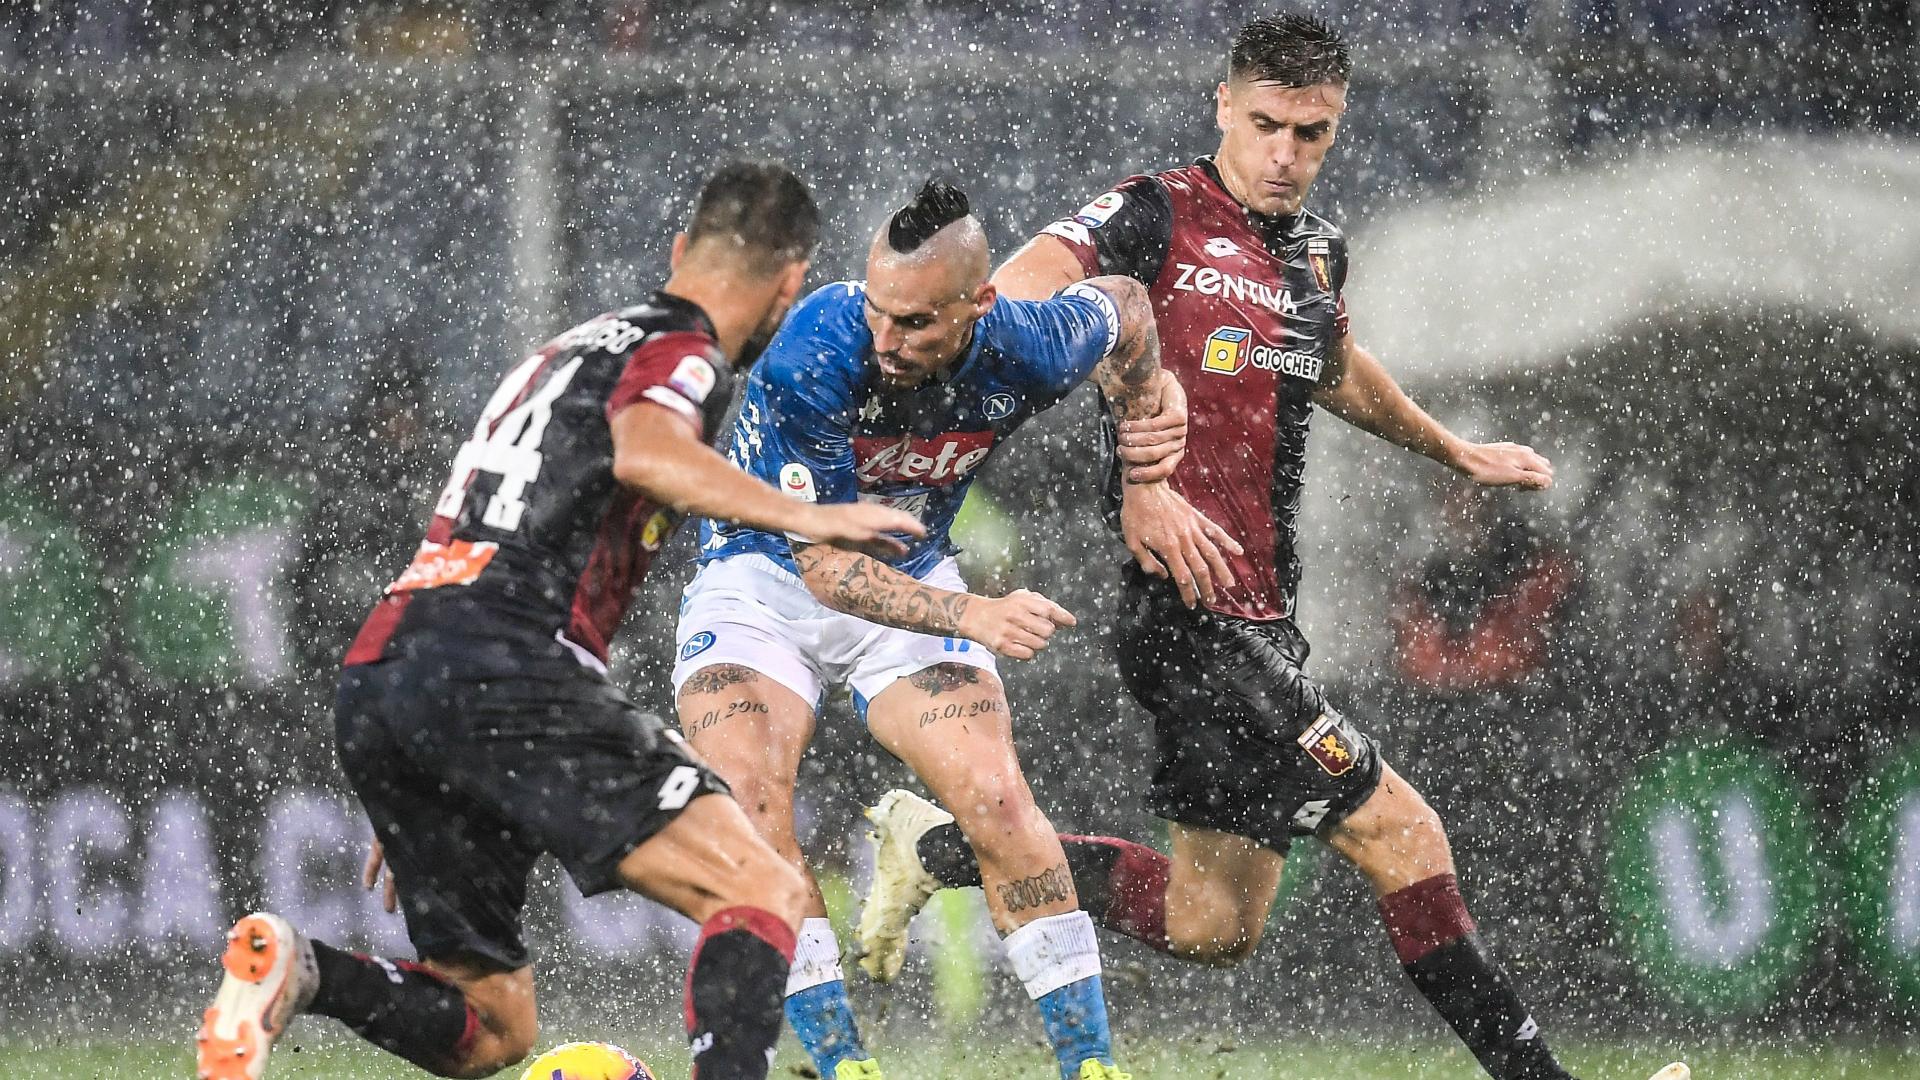 Marek Hamsik Krzysztof Piatek Genoa Napoli Serie A